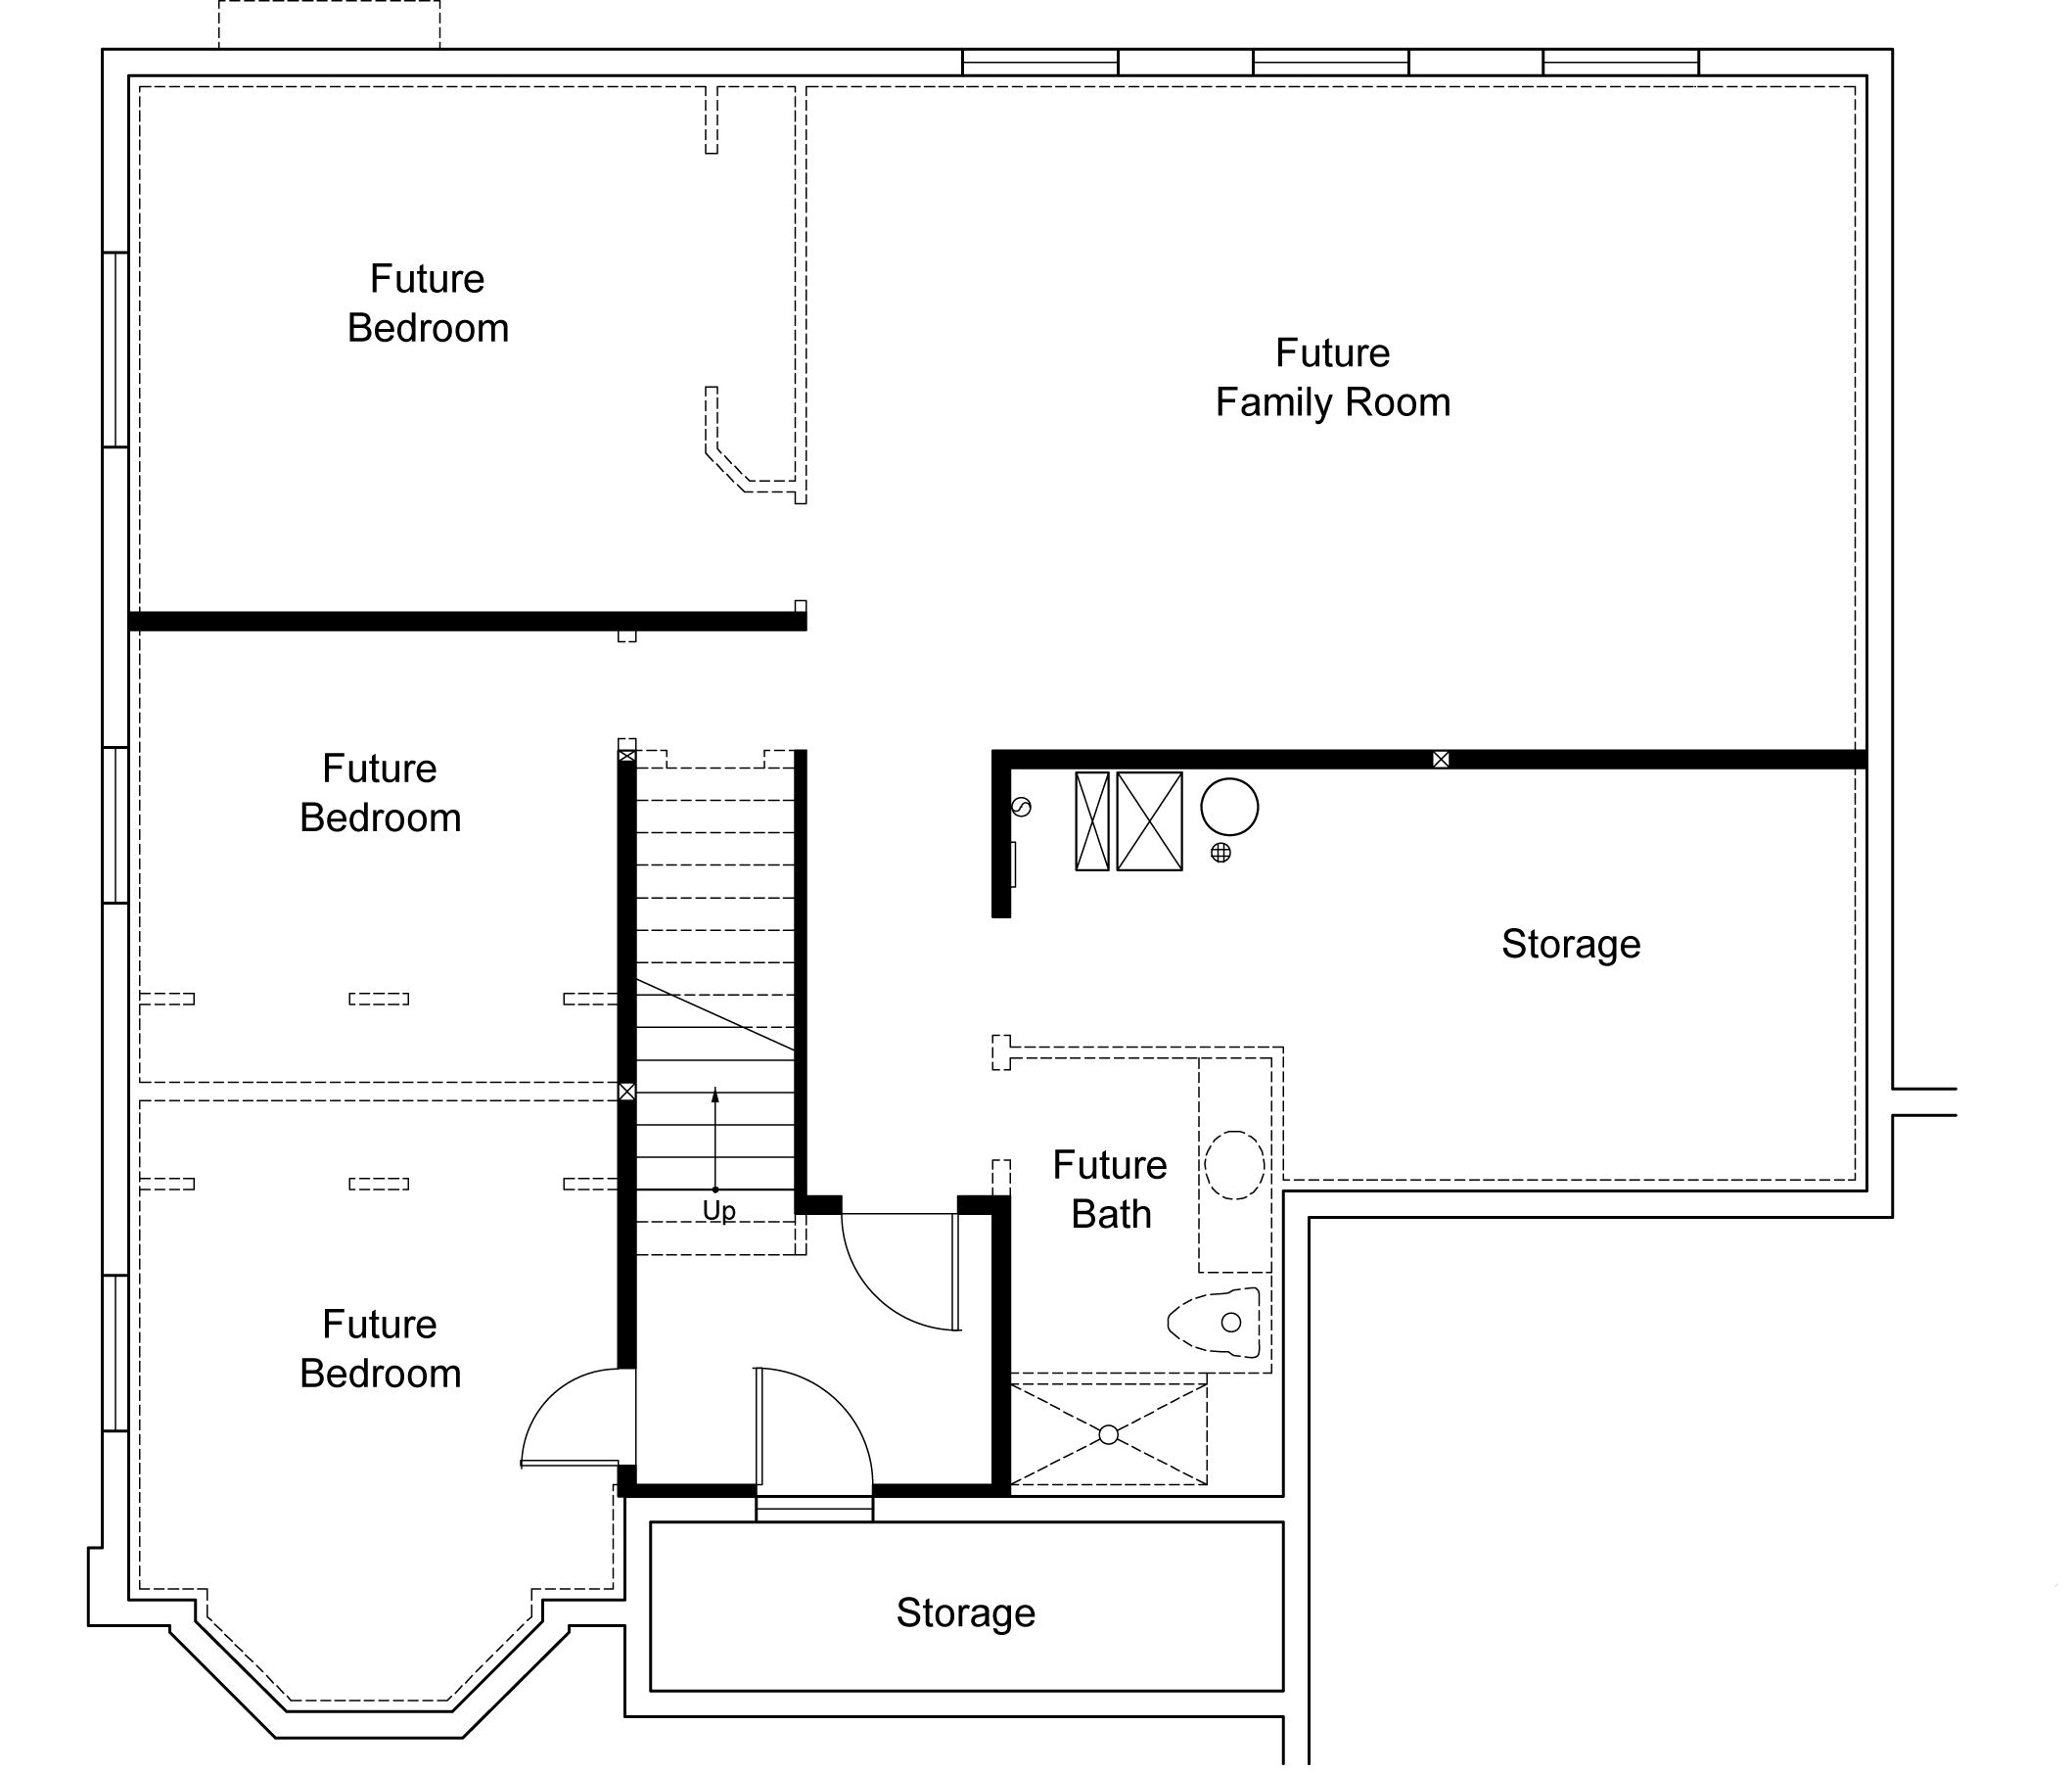 Venezia European Home Design For New Homes In Utah House Floor Plans European House Floor Plans